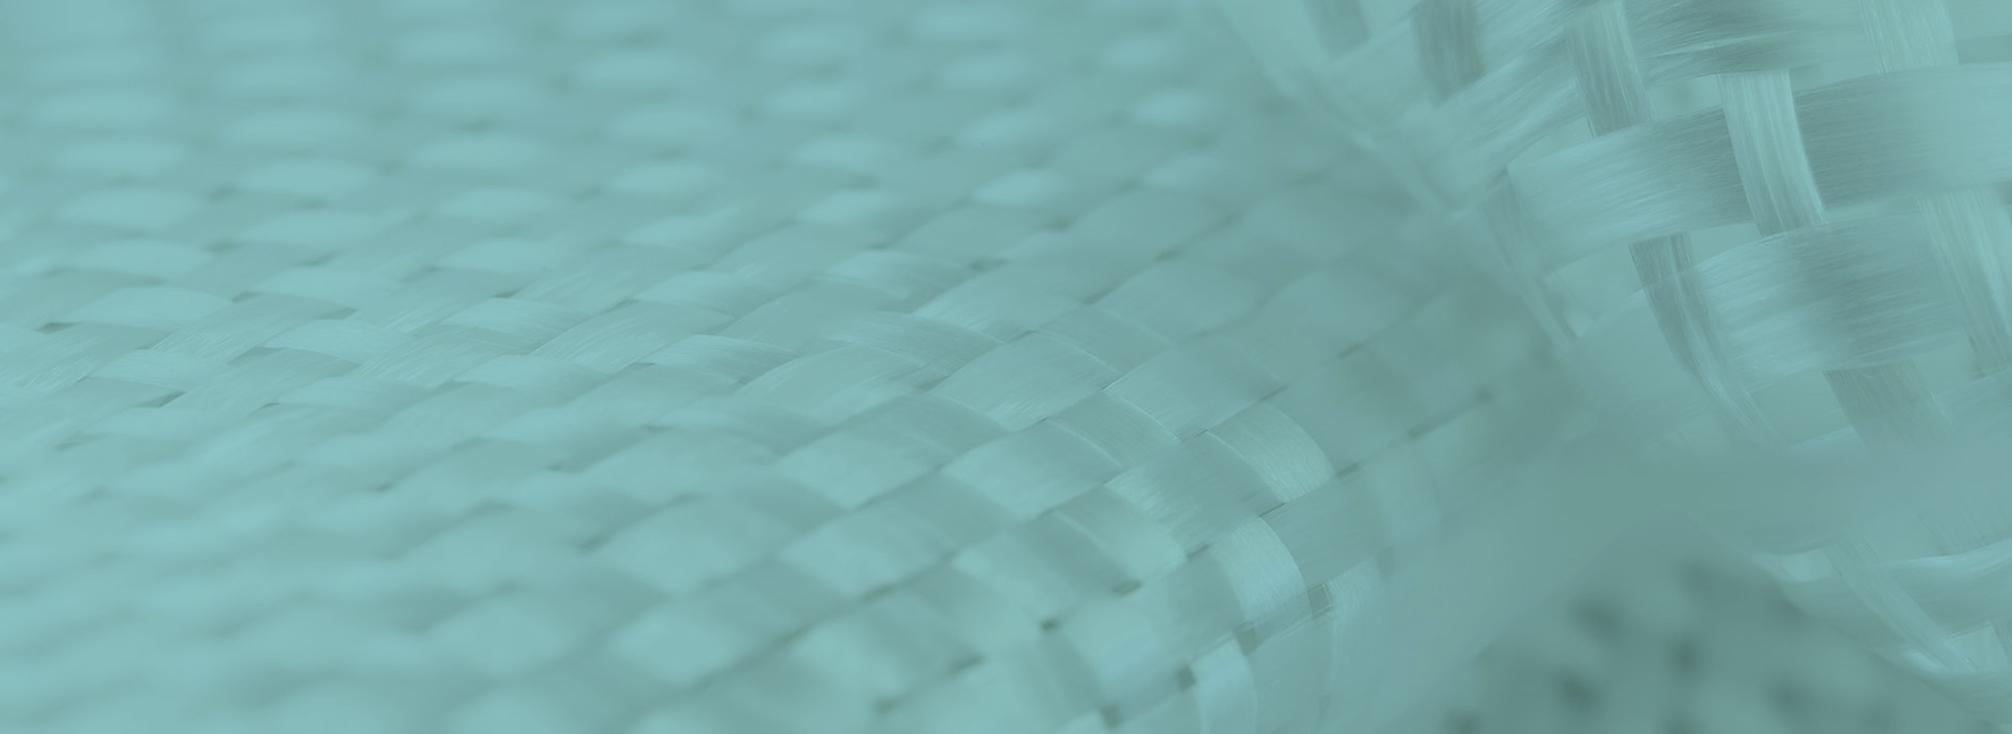 DK Polyester Techniek blauwgroen